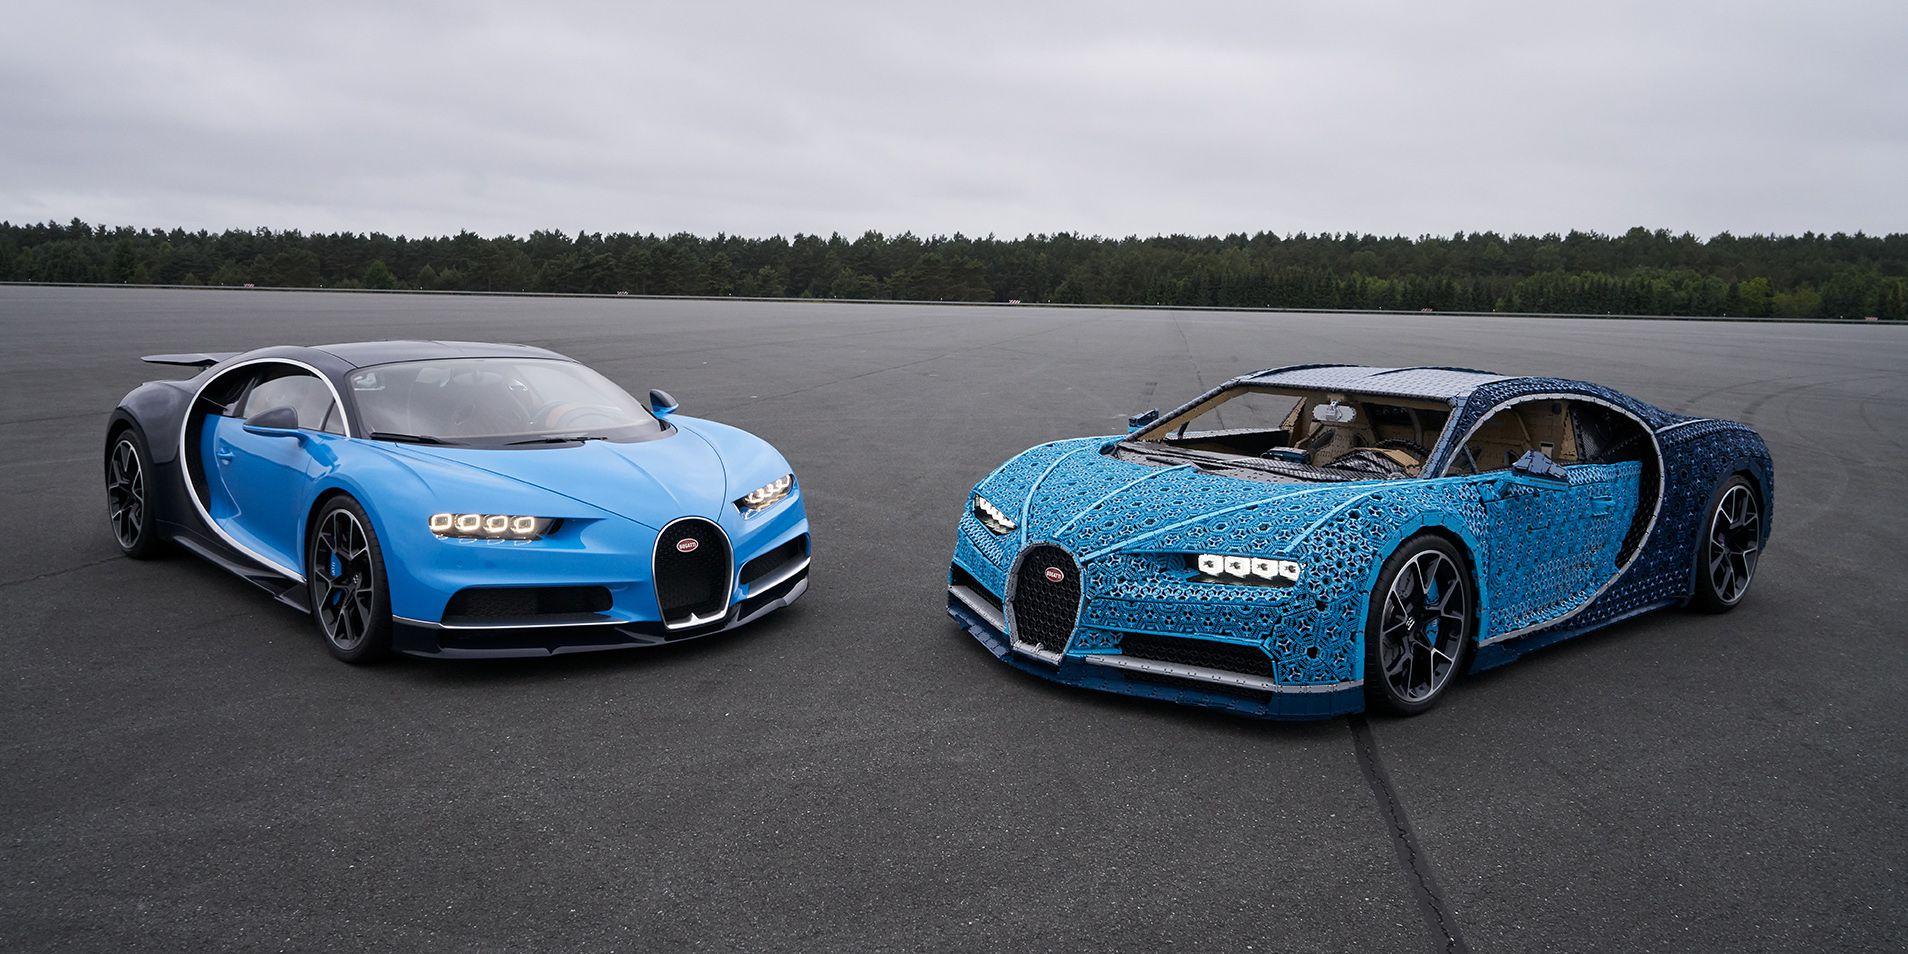 Lego Une Bugatti Chiron Realisee En Taille Reelle Ere Numerique